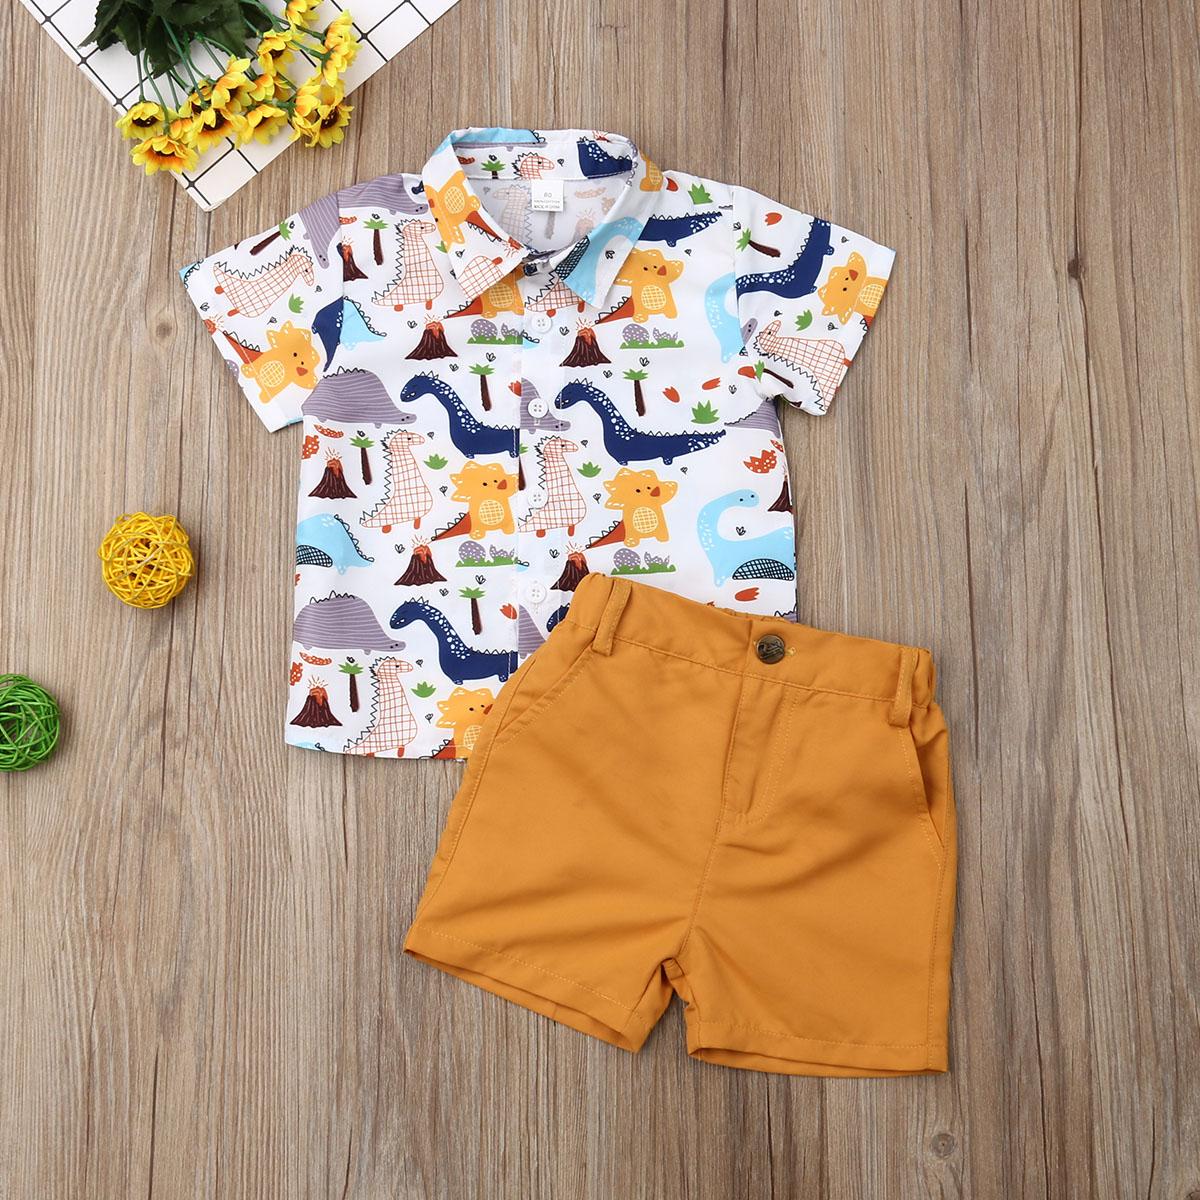 Pudcoco Summer Toddler Baby Boy Clothes Cute Dinosaur Print Shirt Tops Short Pants 2Pcs Outfits Sunsuit Summer Clothes